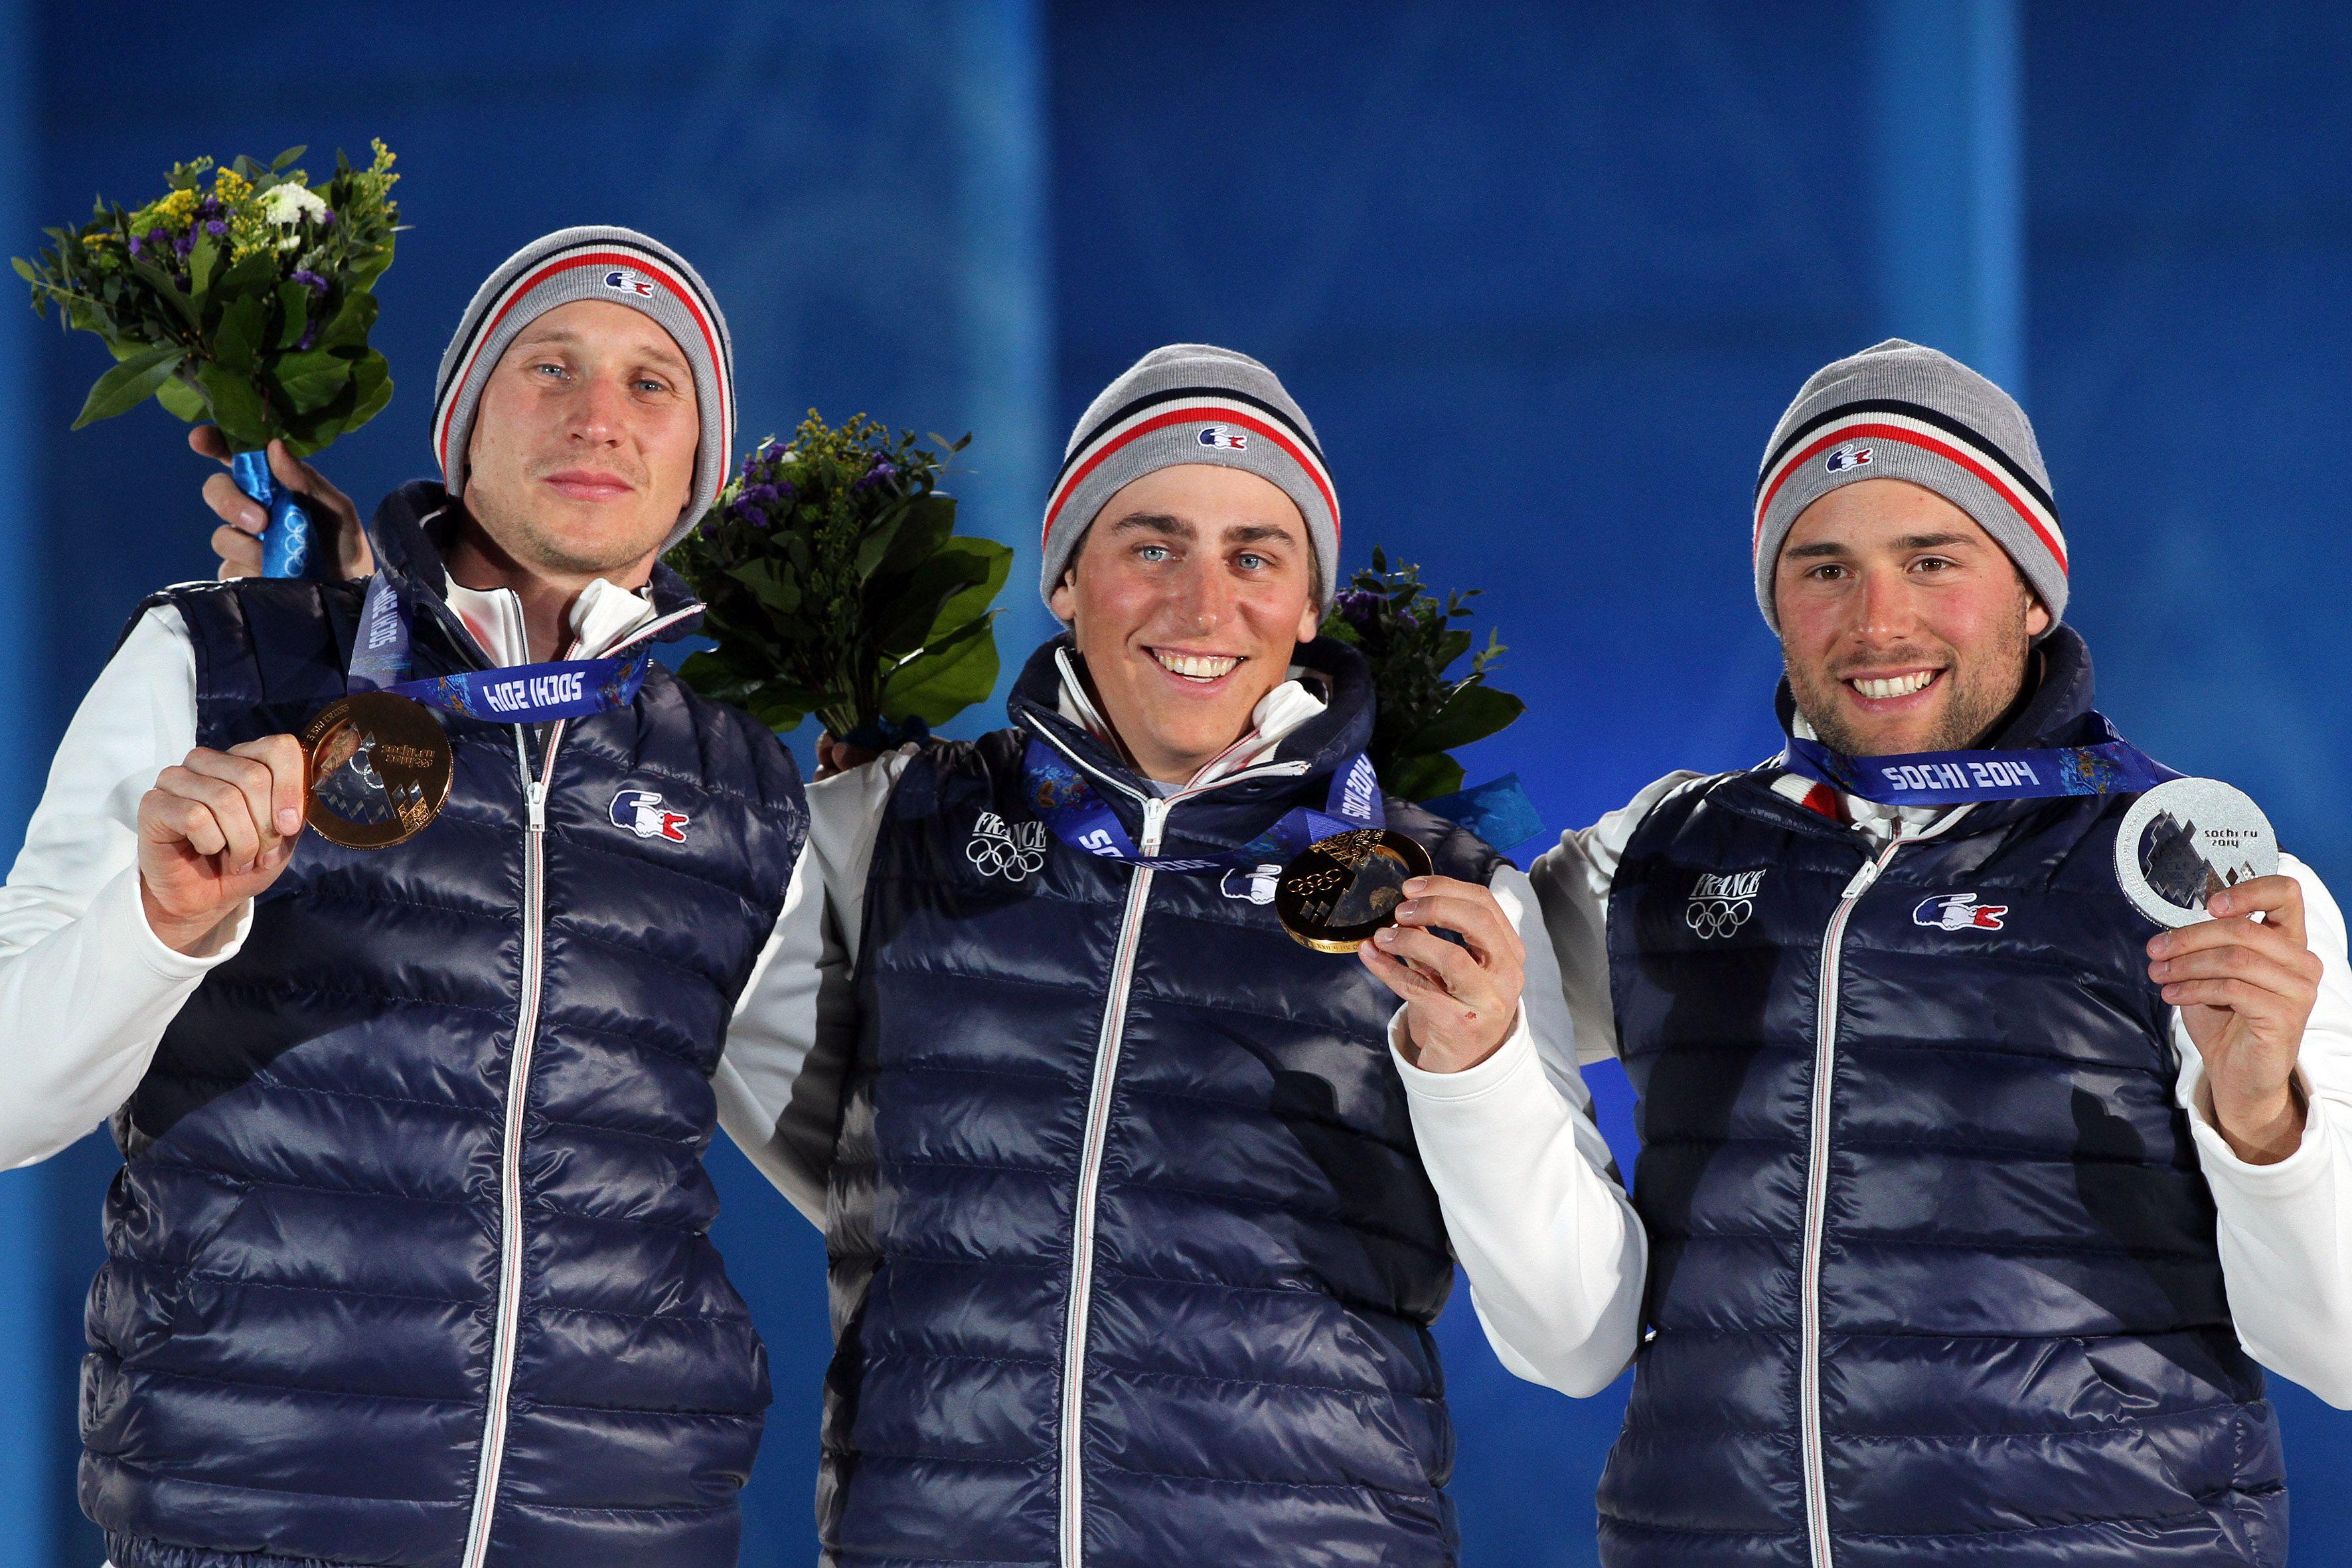 Freestyle Men's Ski Cross Podium Arnaud Bovolenta from